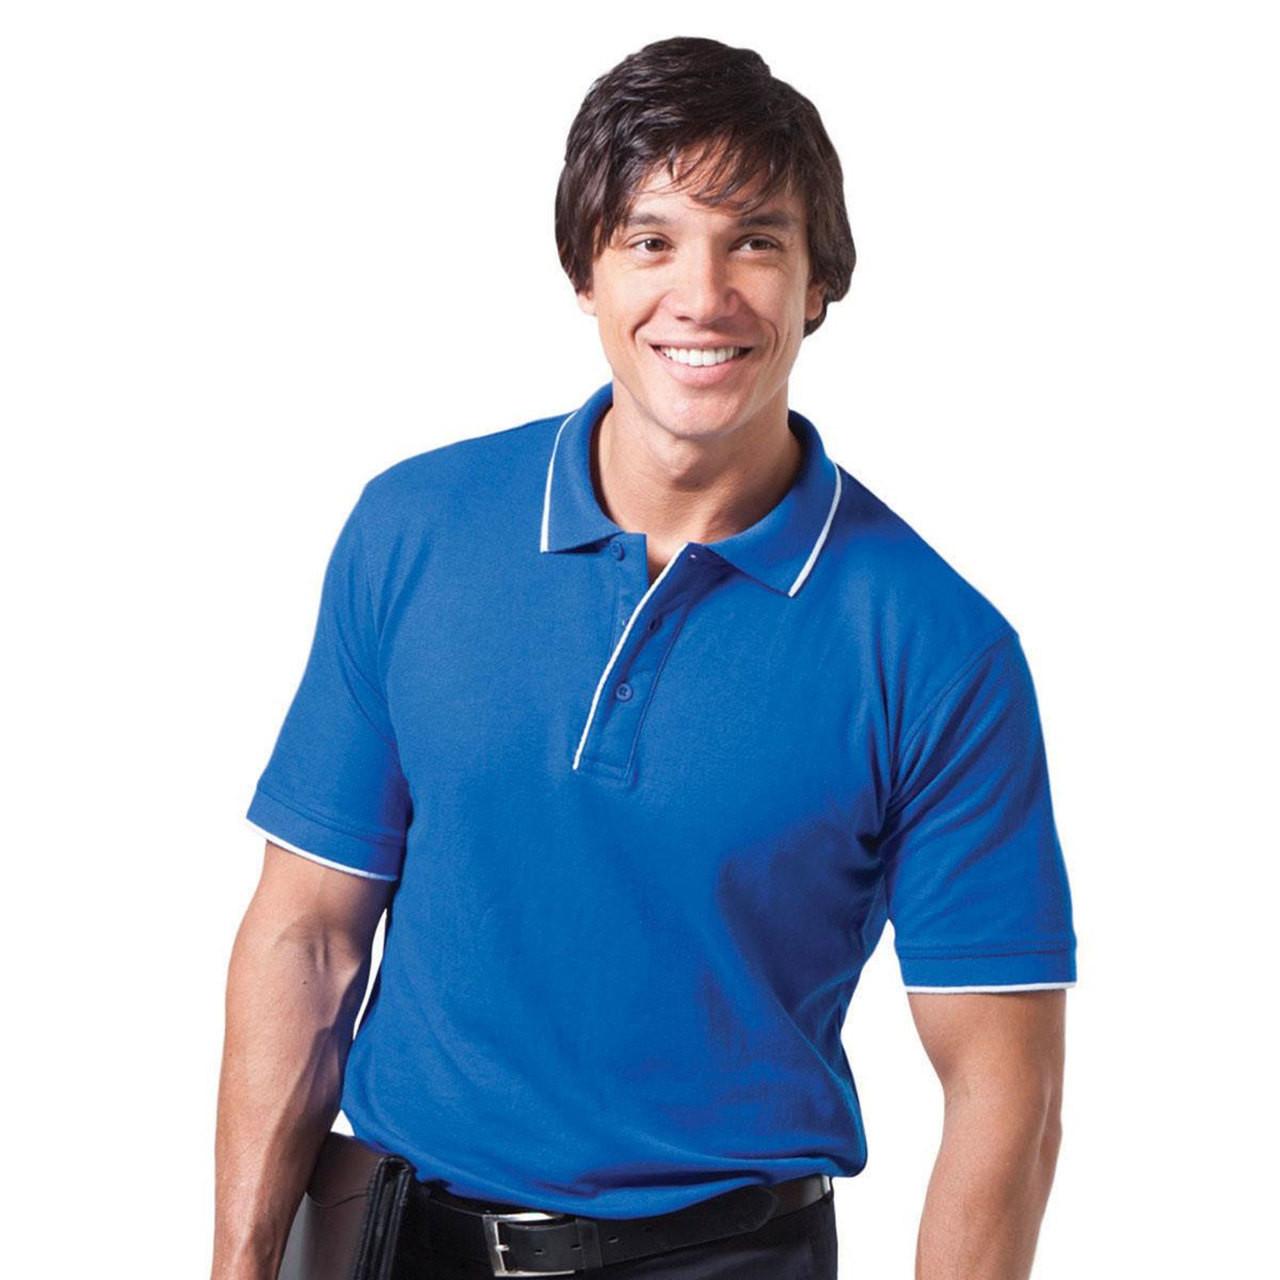 50f5d1f2 Bulk Discount Plain Mens Polo Shirts Online | Blank Clothing Australia